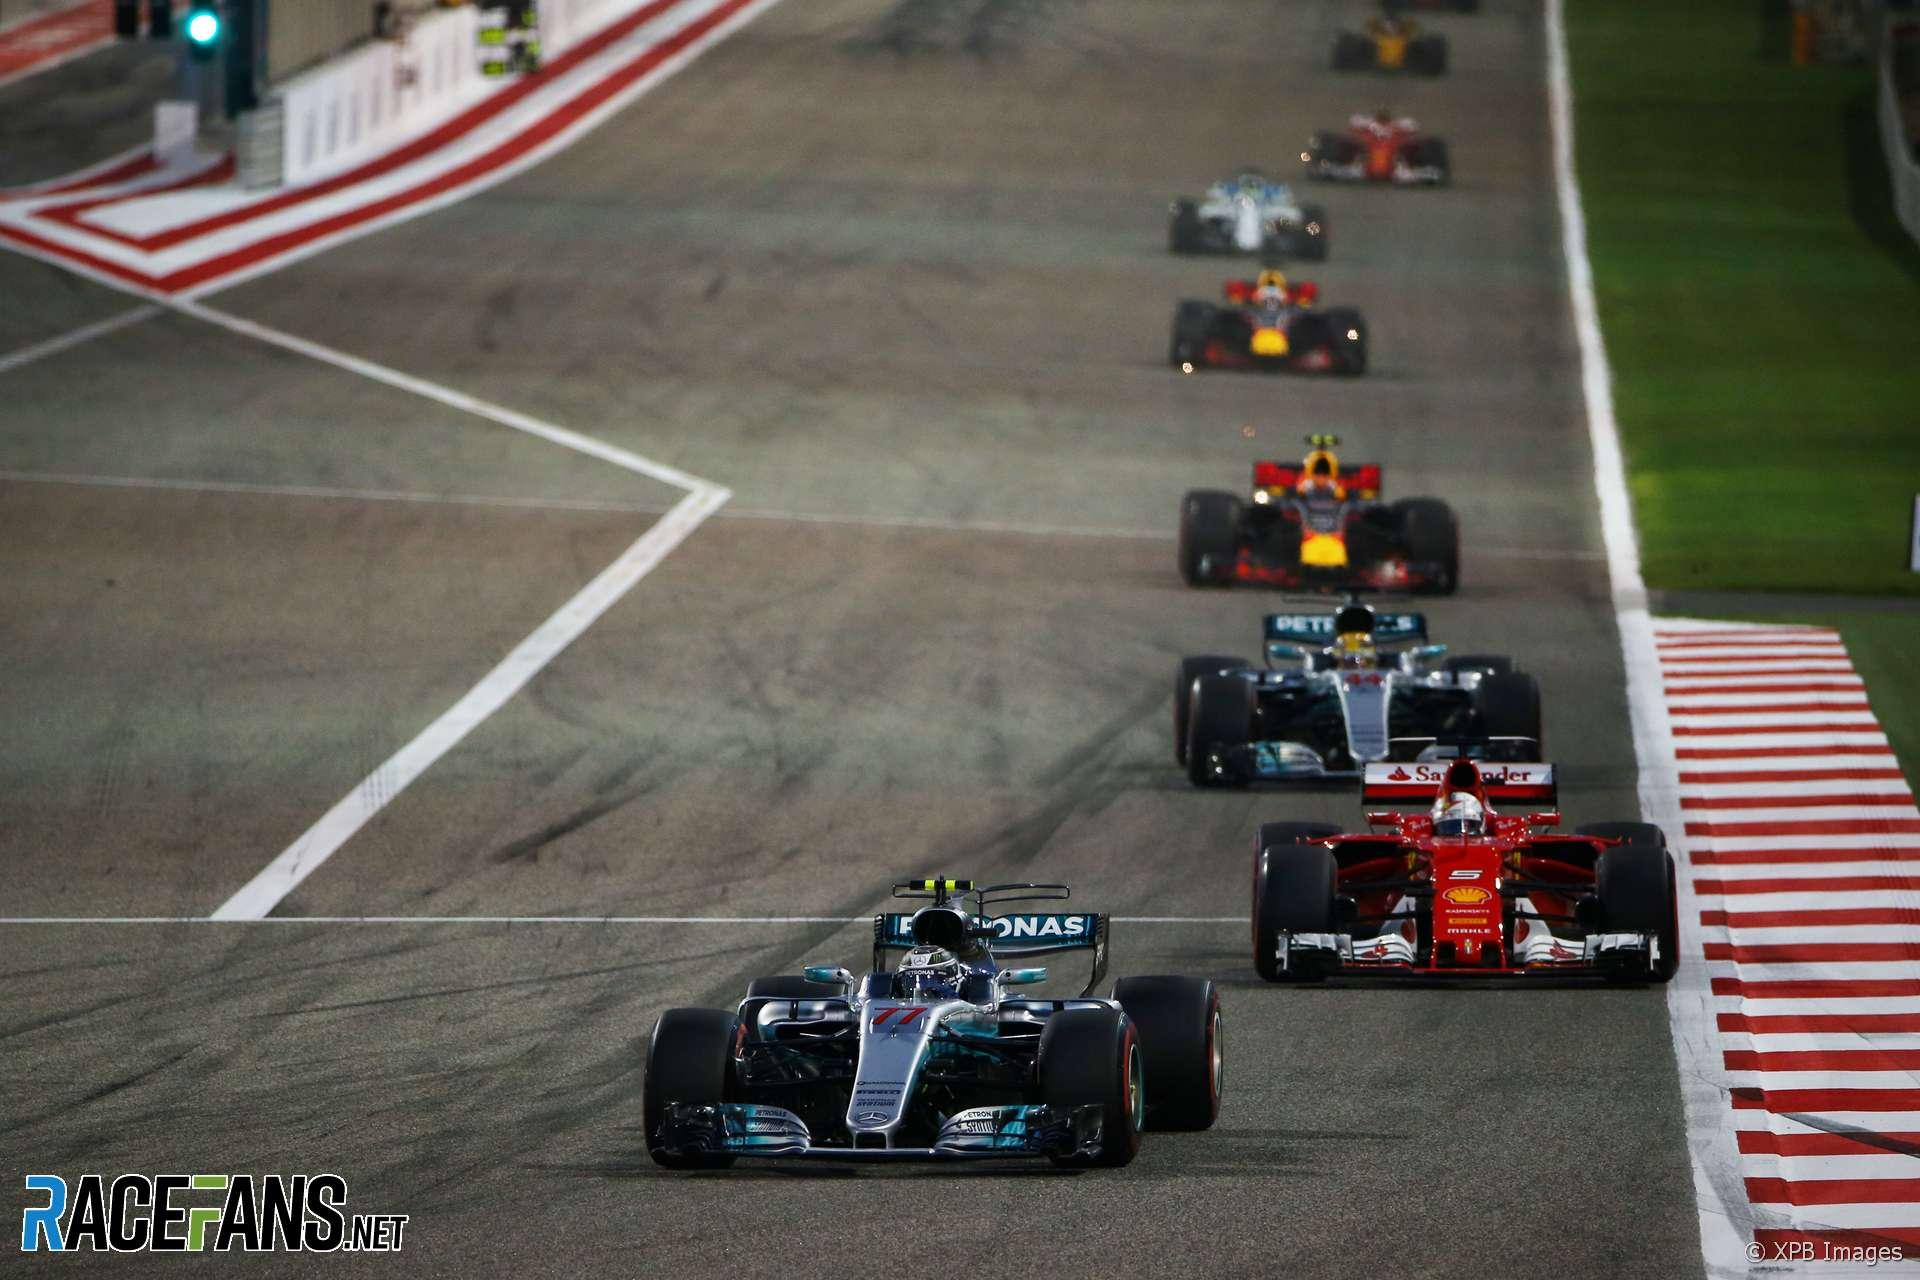 Valtteri Bottas, Mercedes, Bahrain, 2017